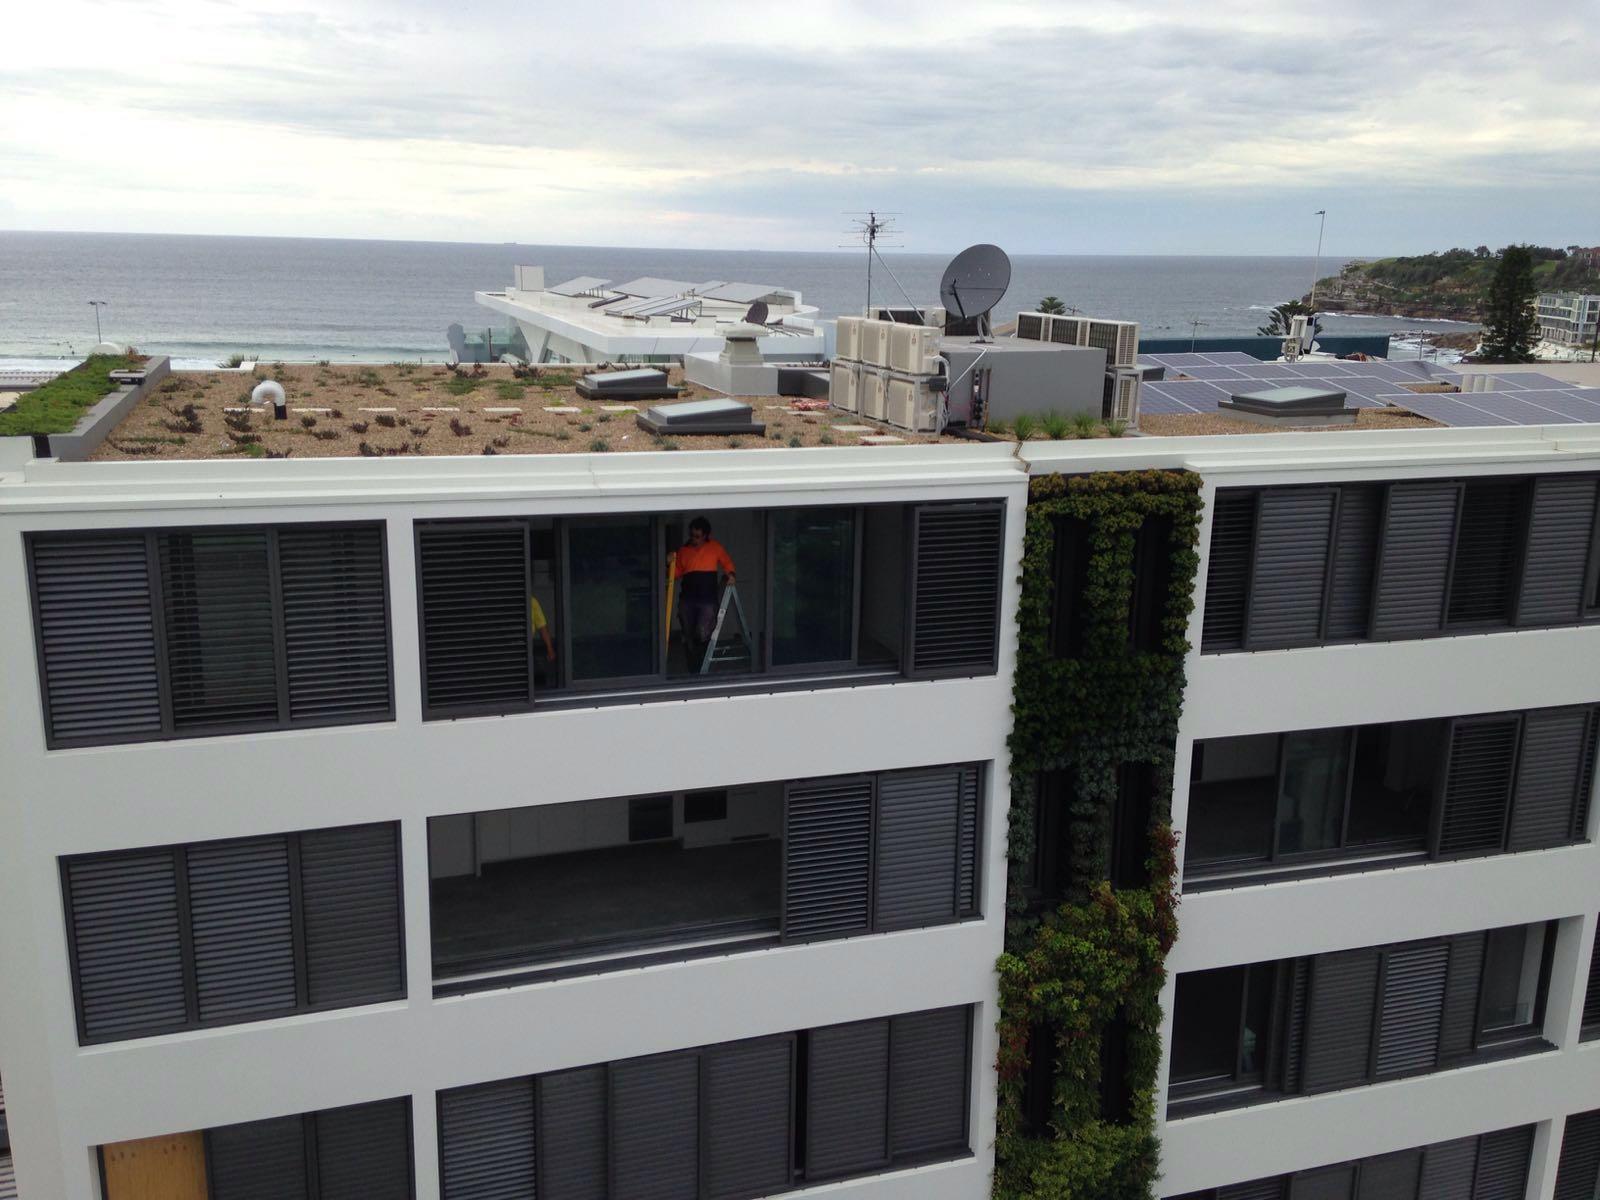 Green Roof Green Wall Vertical Garden Installation Bondi Beach Sydney Australia